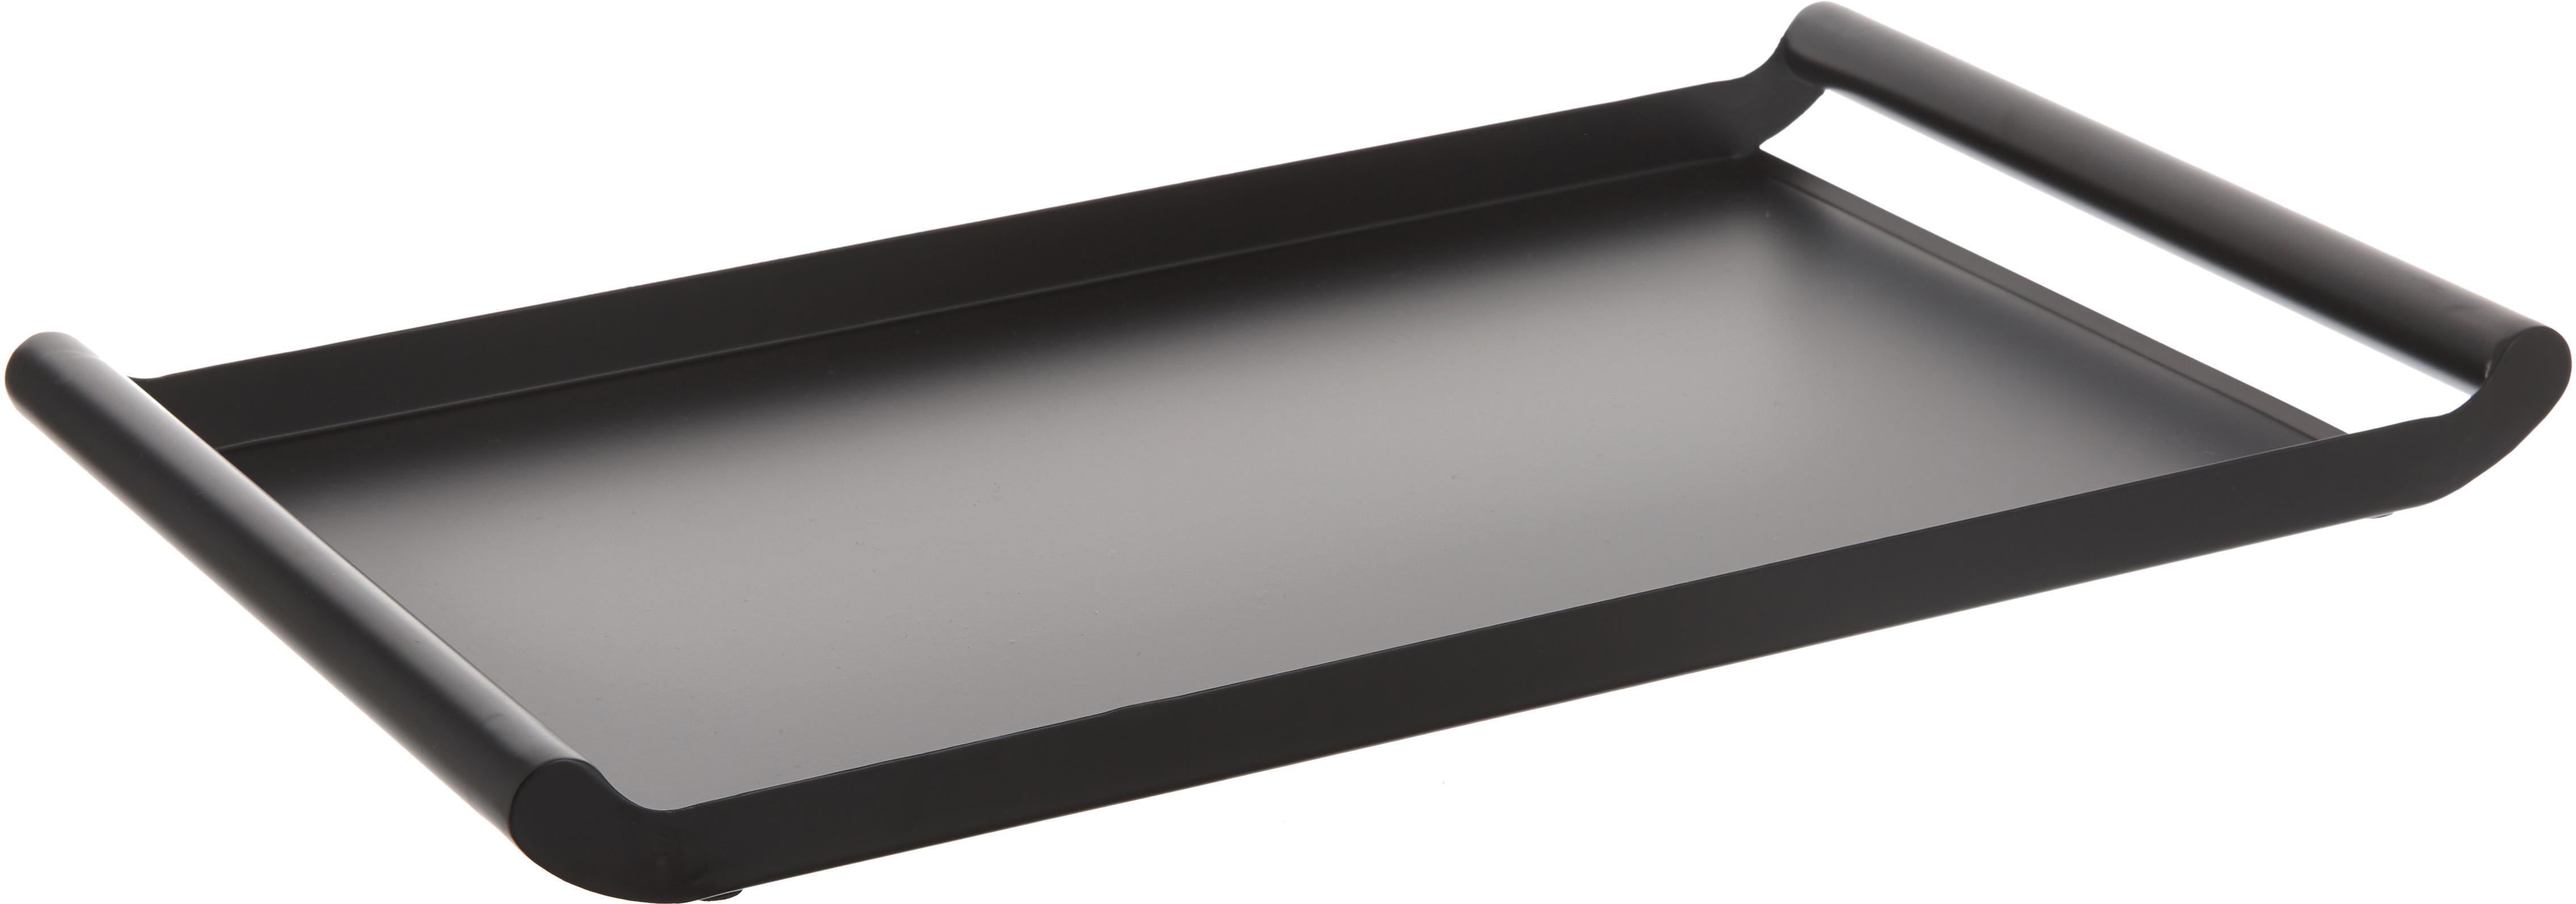 Vassoio Charlie in nero, Metallo rivestito, Nero, Larg. 50 x Prof. 30 cm